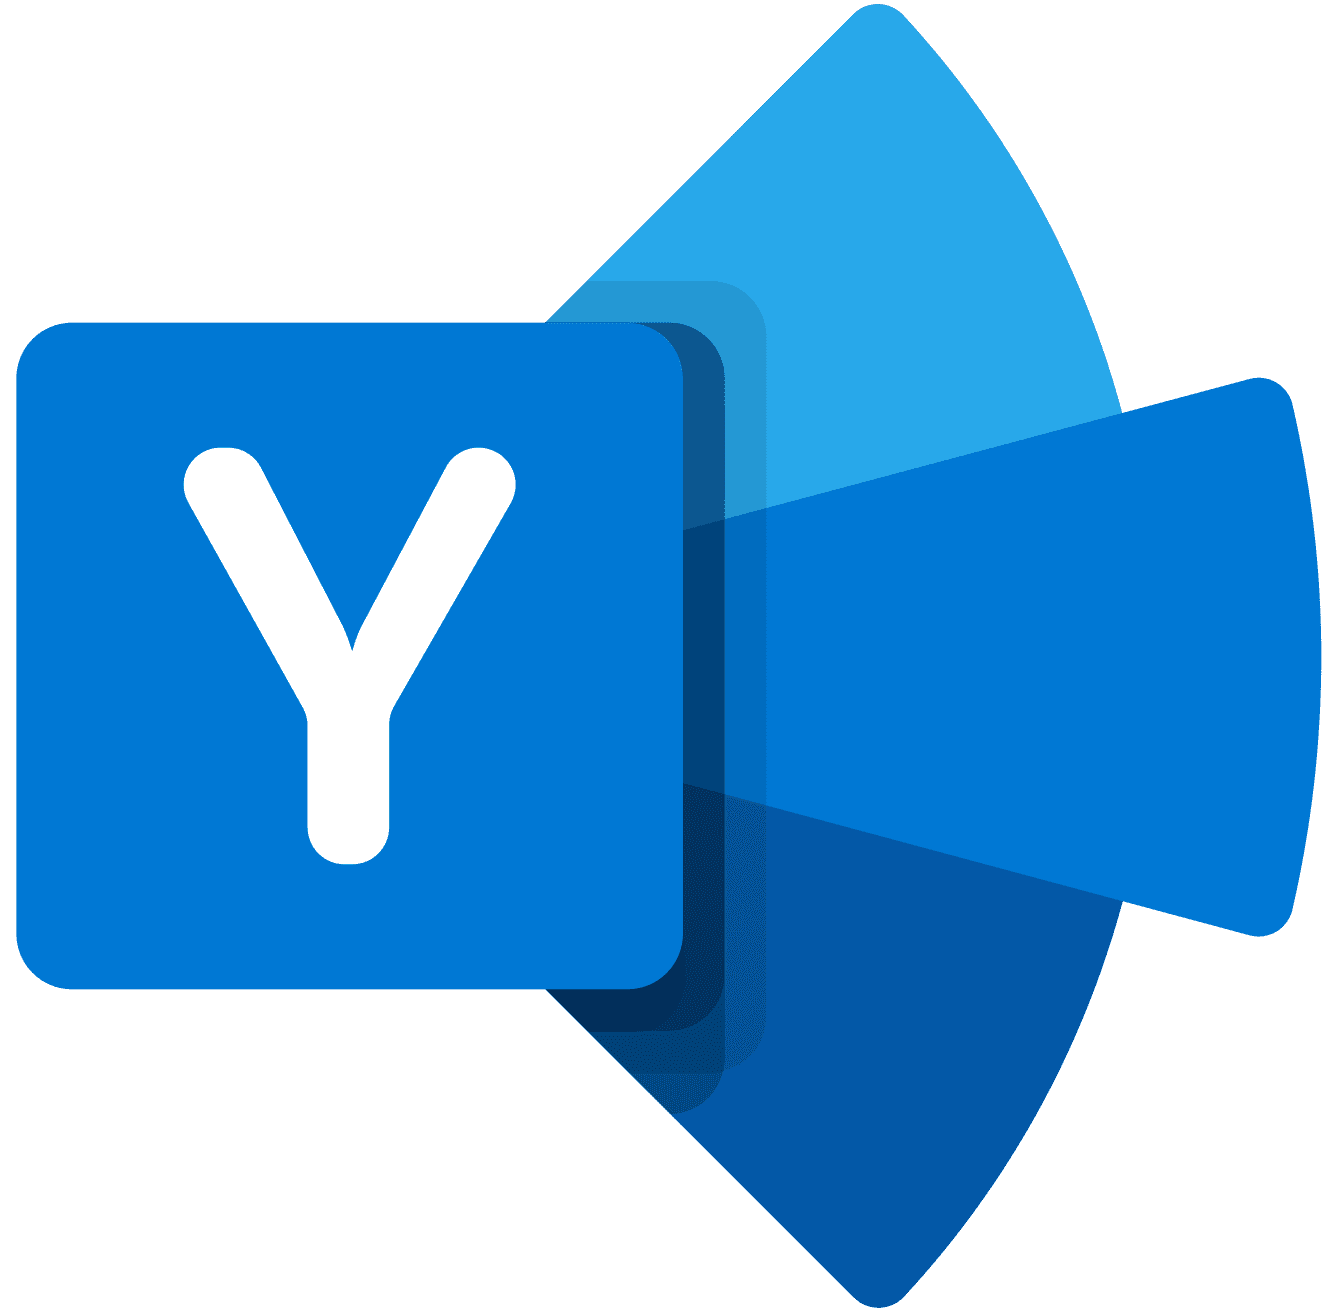 Microsoft Yammer(야머) 로고